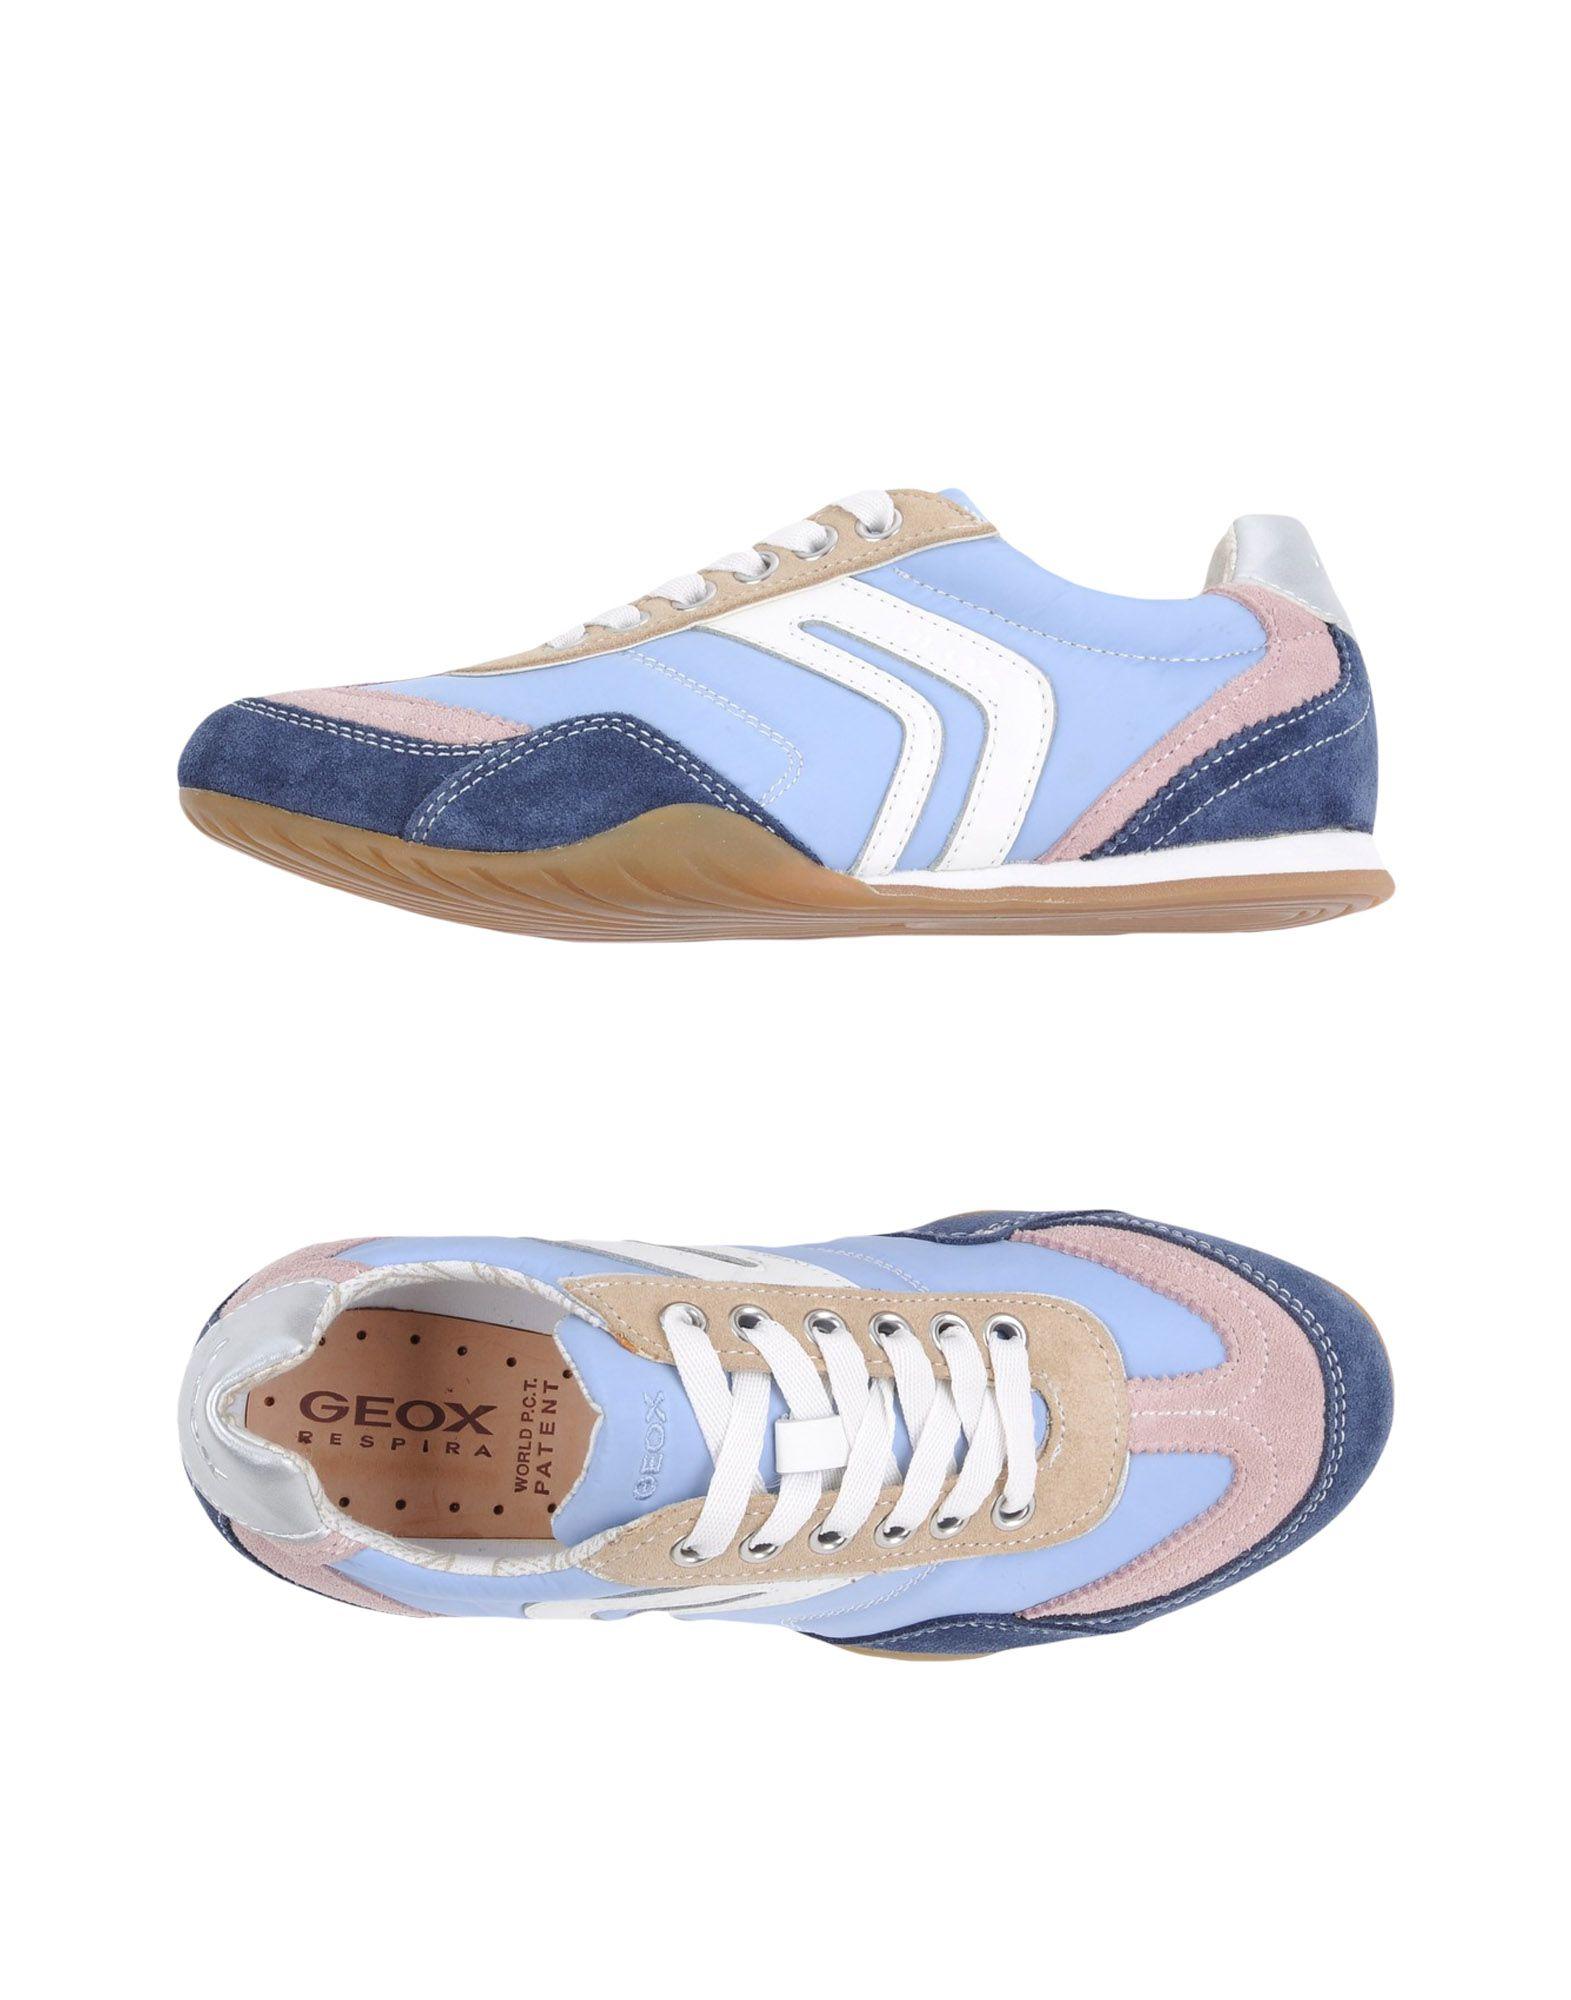 Moda Sneakers Geox Donna - 11328649GX